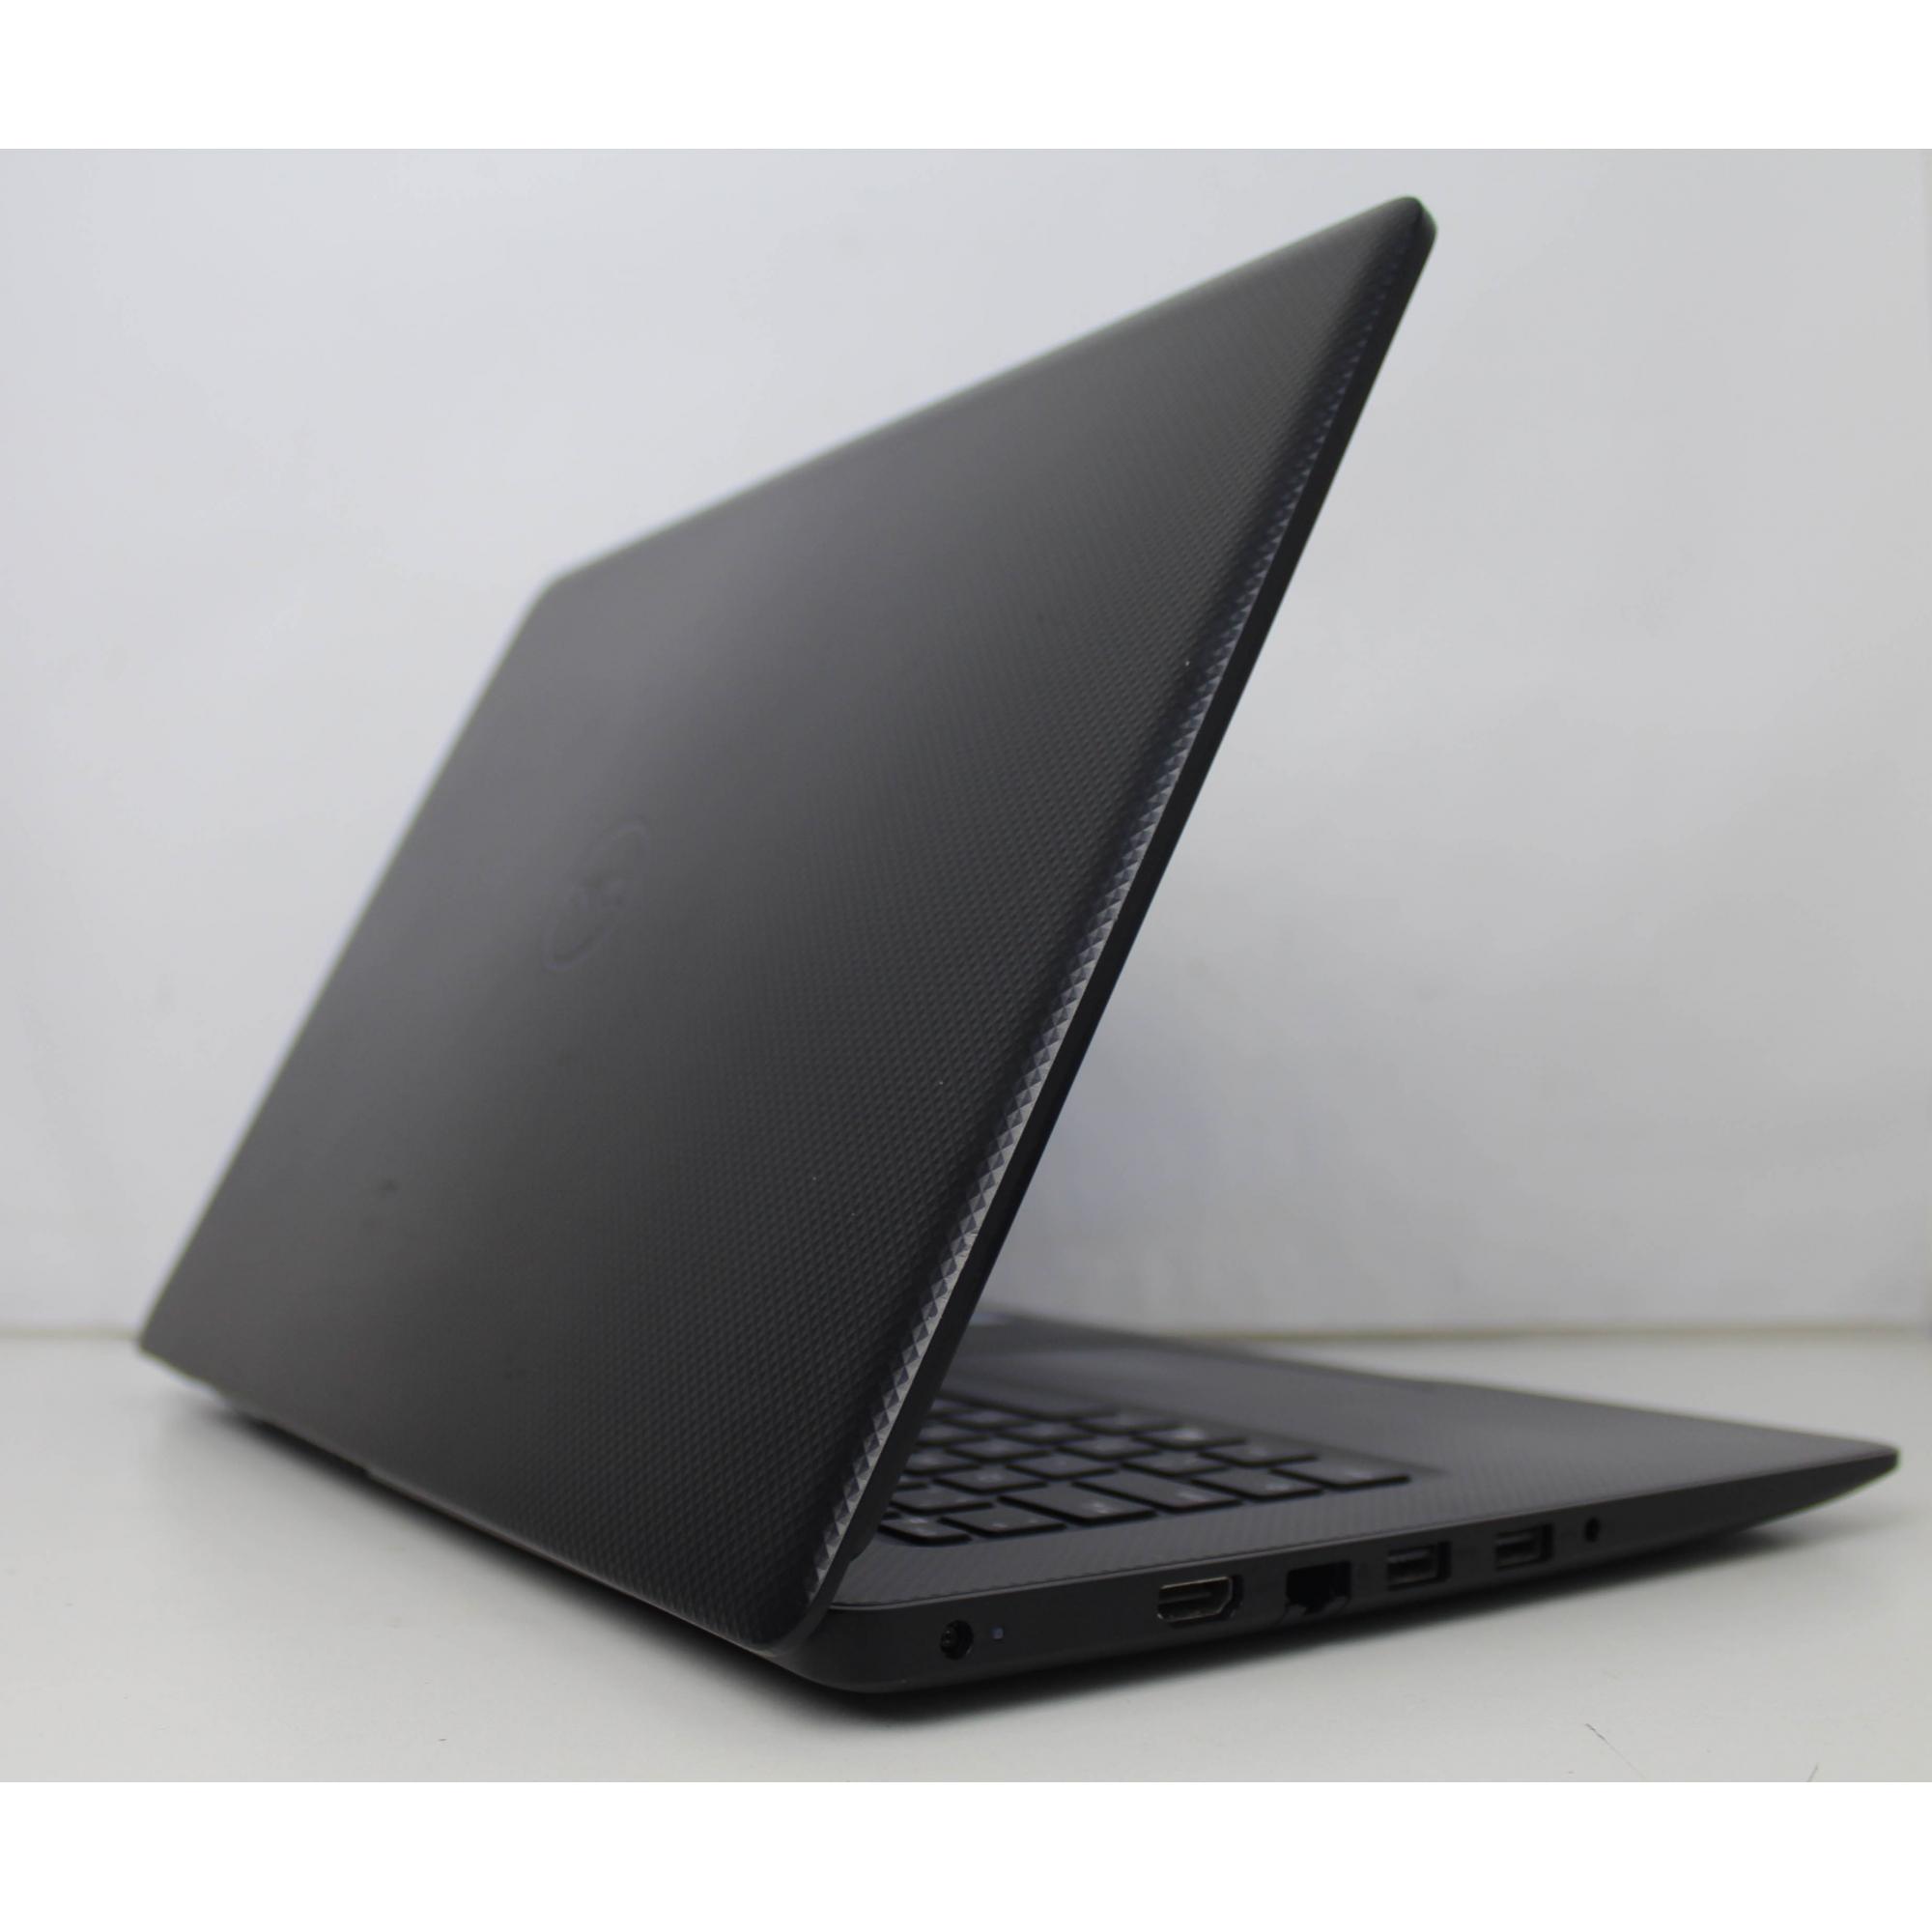 NOTEBOOK DELL VOSTRO 3480 14'' INTEL CORE I5 8ª GERAÇÃO 8GB SSD-240GB